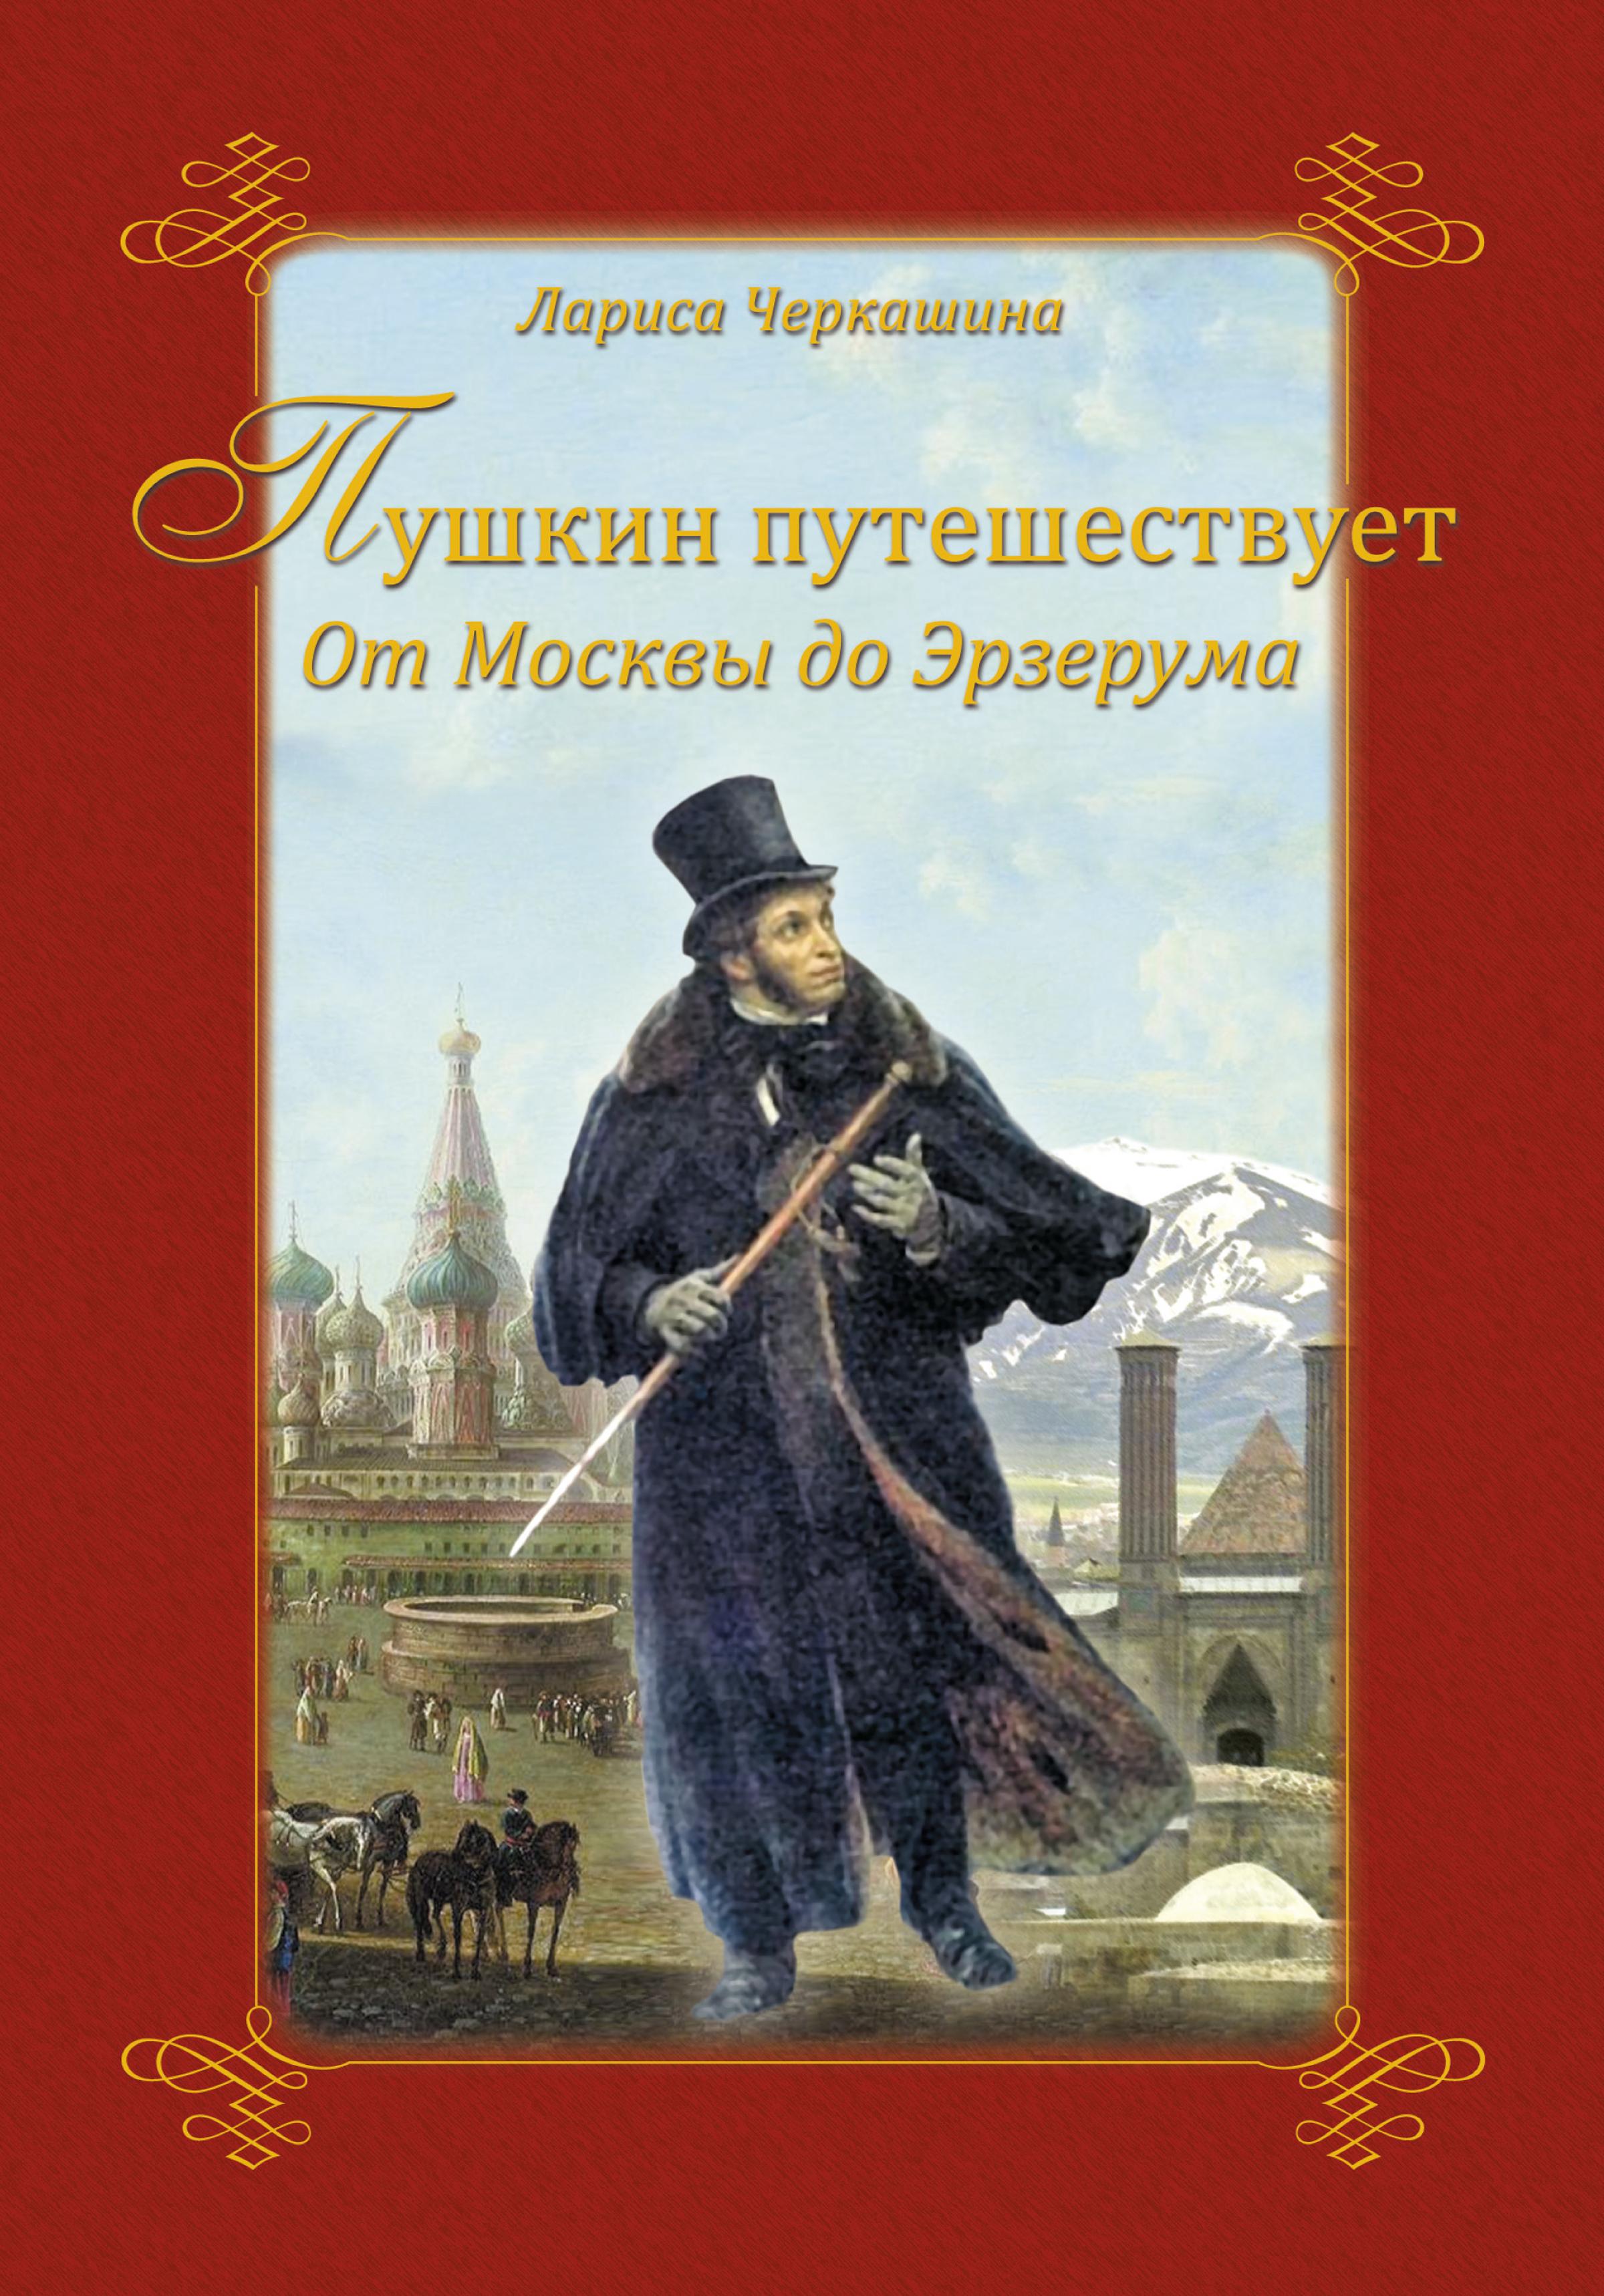 Лариса Черкашина Пушкин путешествует. От Москвы до Эрзерума наш пушкин